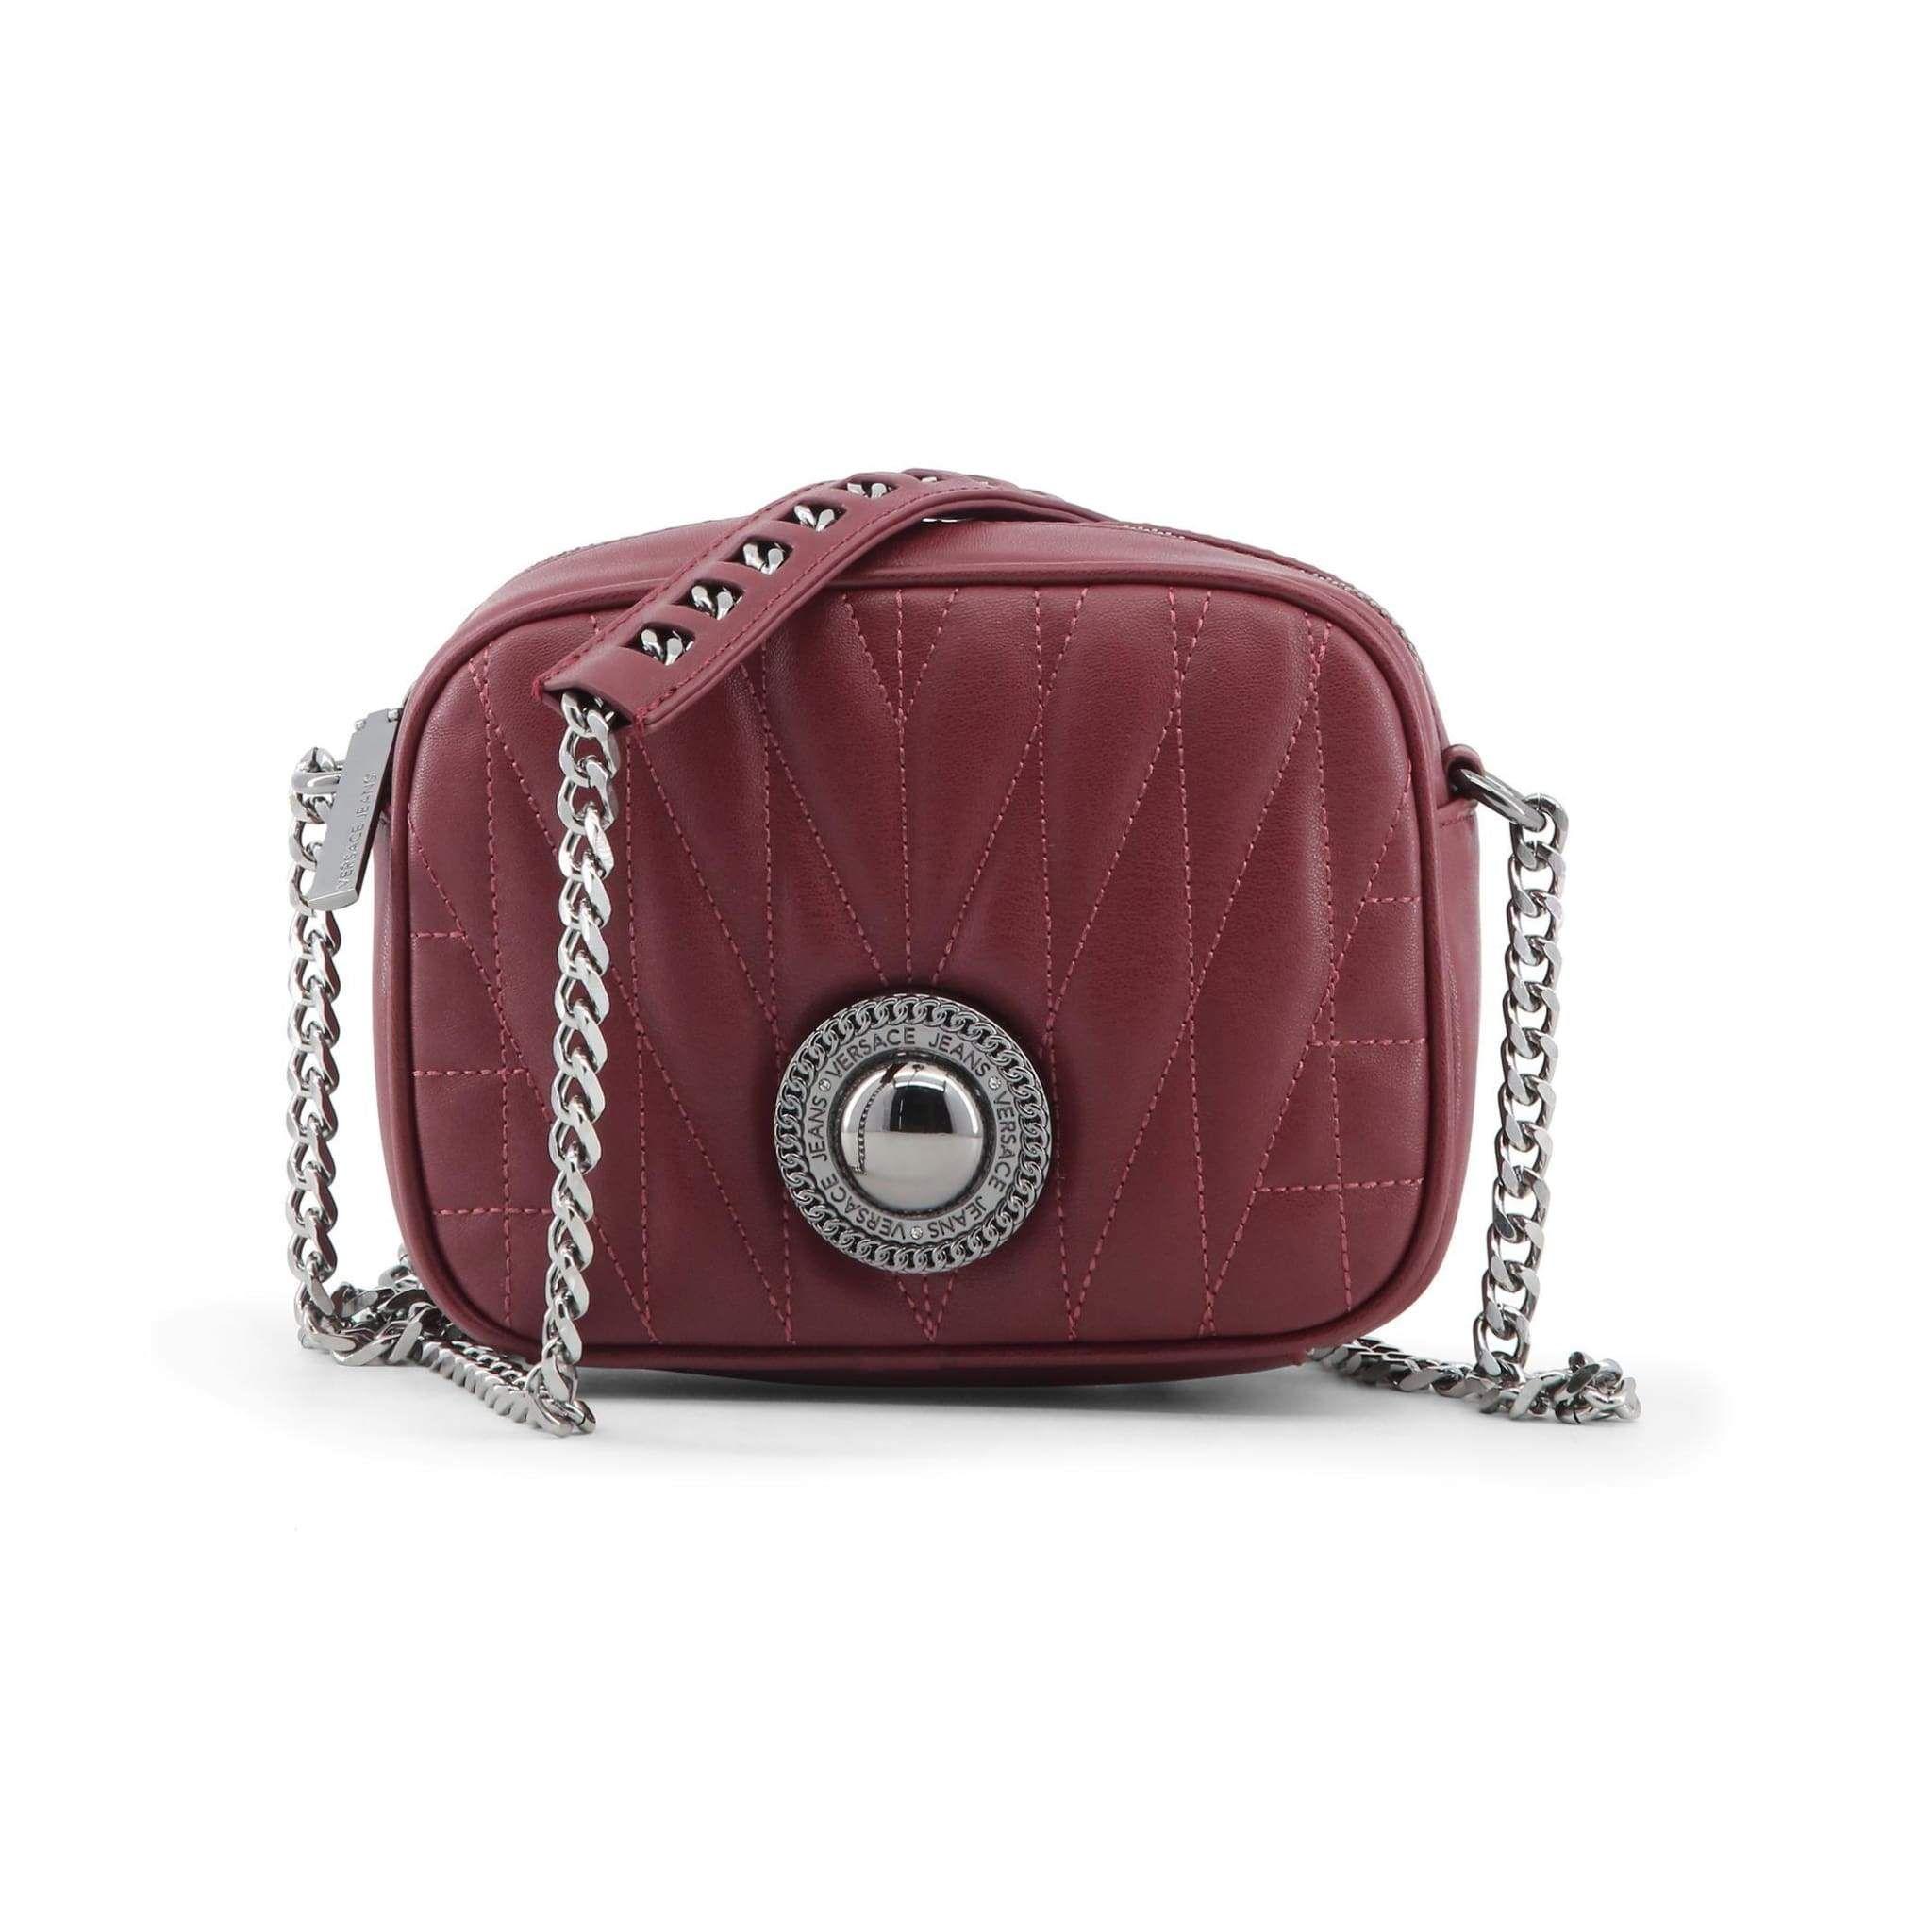 Versace Jeans Women Red Crossbody Bags  5ce35fe33292a